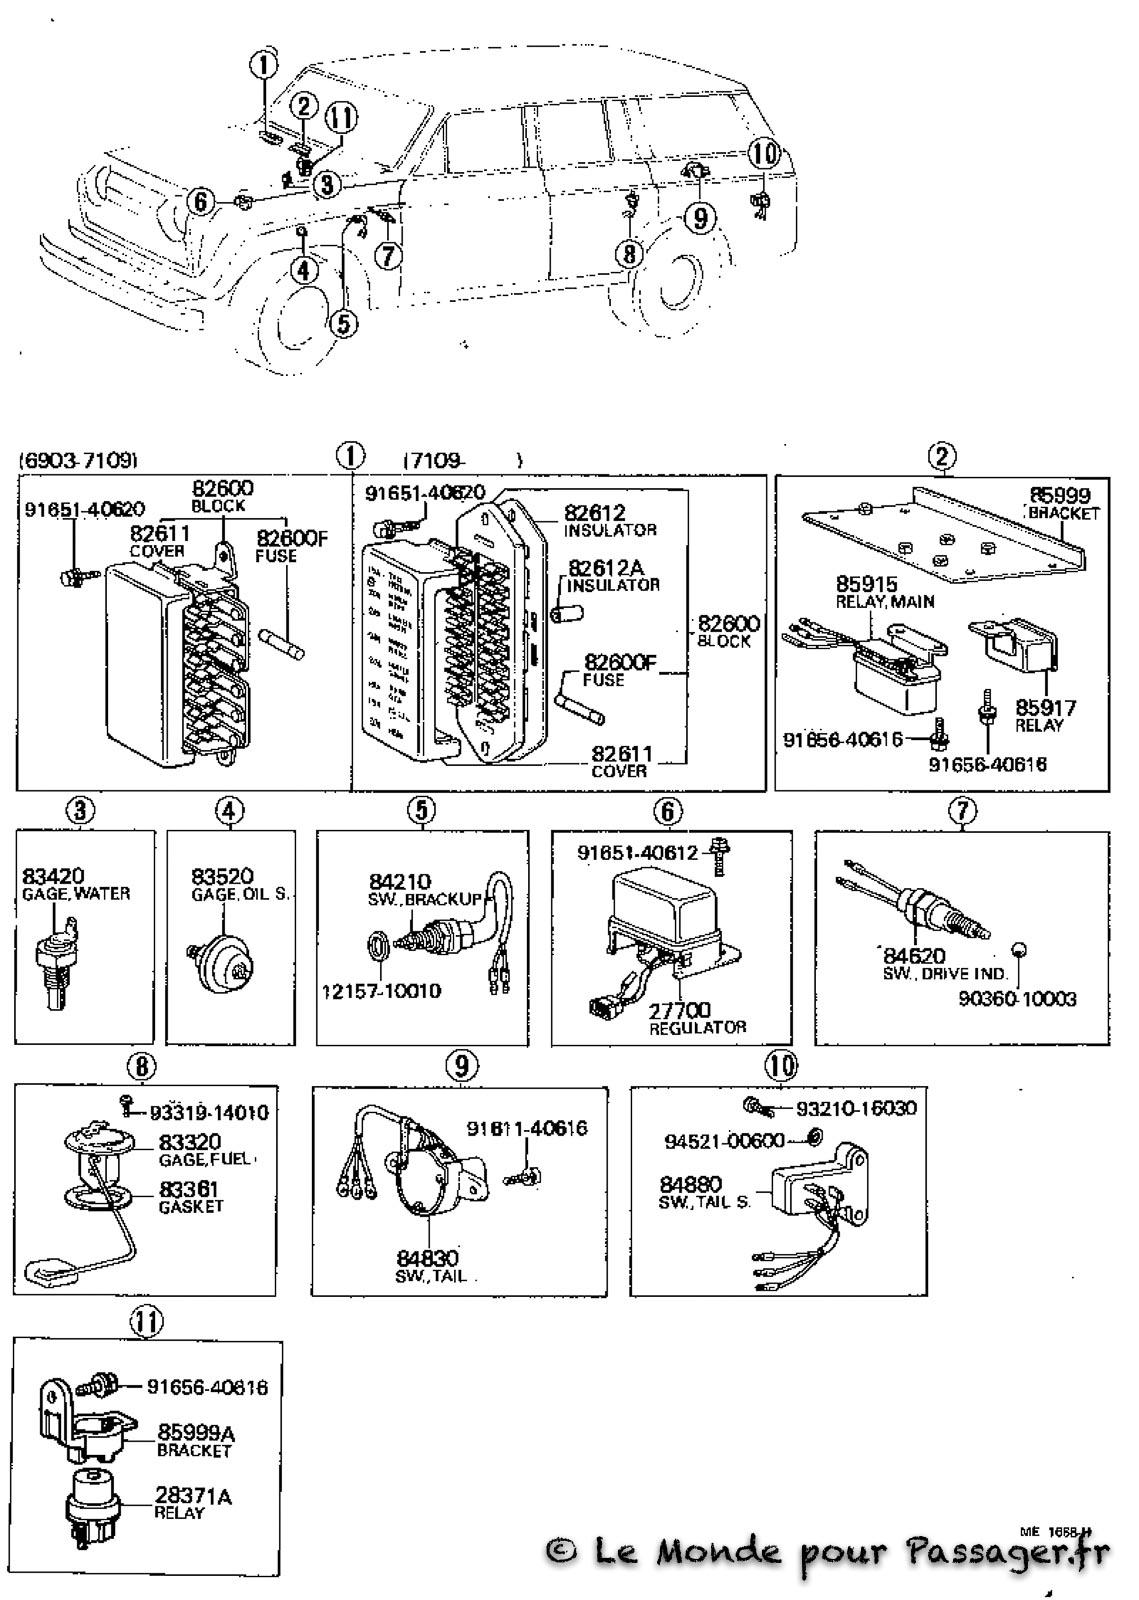 Fj55-Eclatés-Techniques102